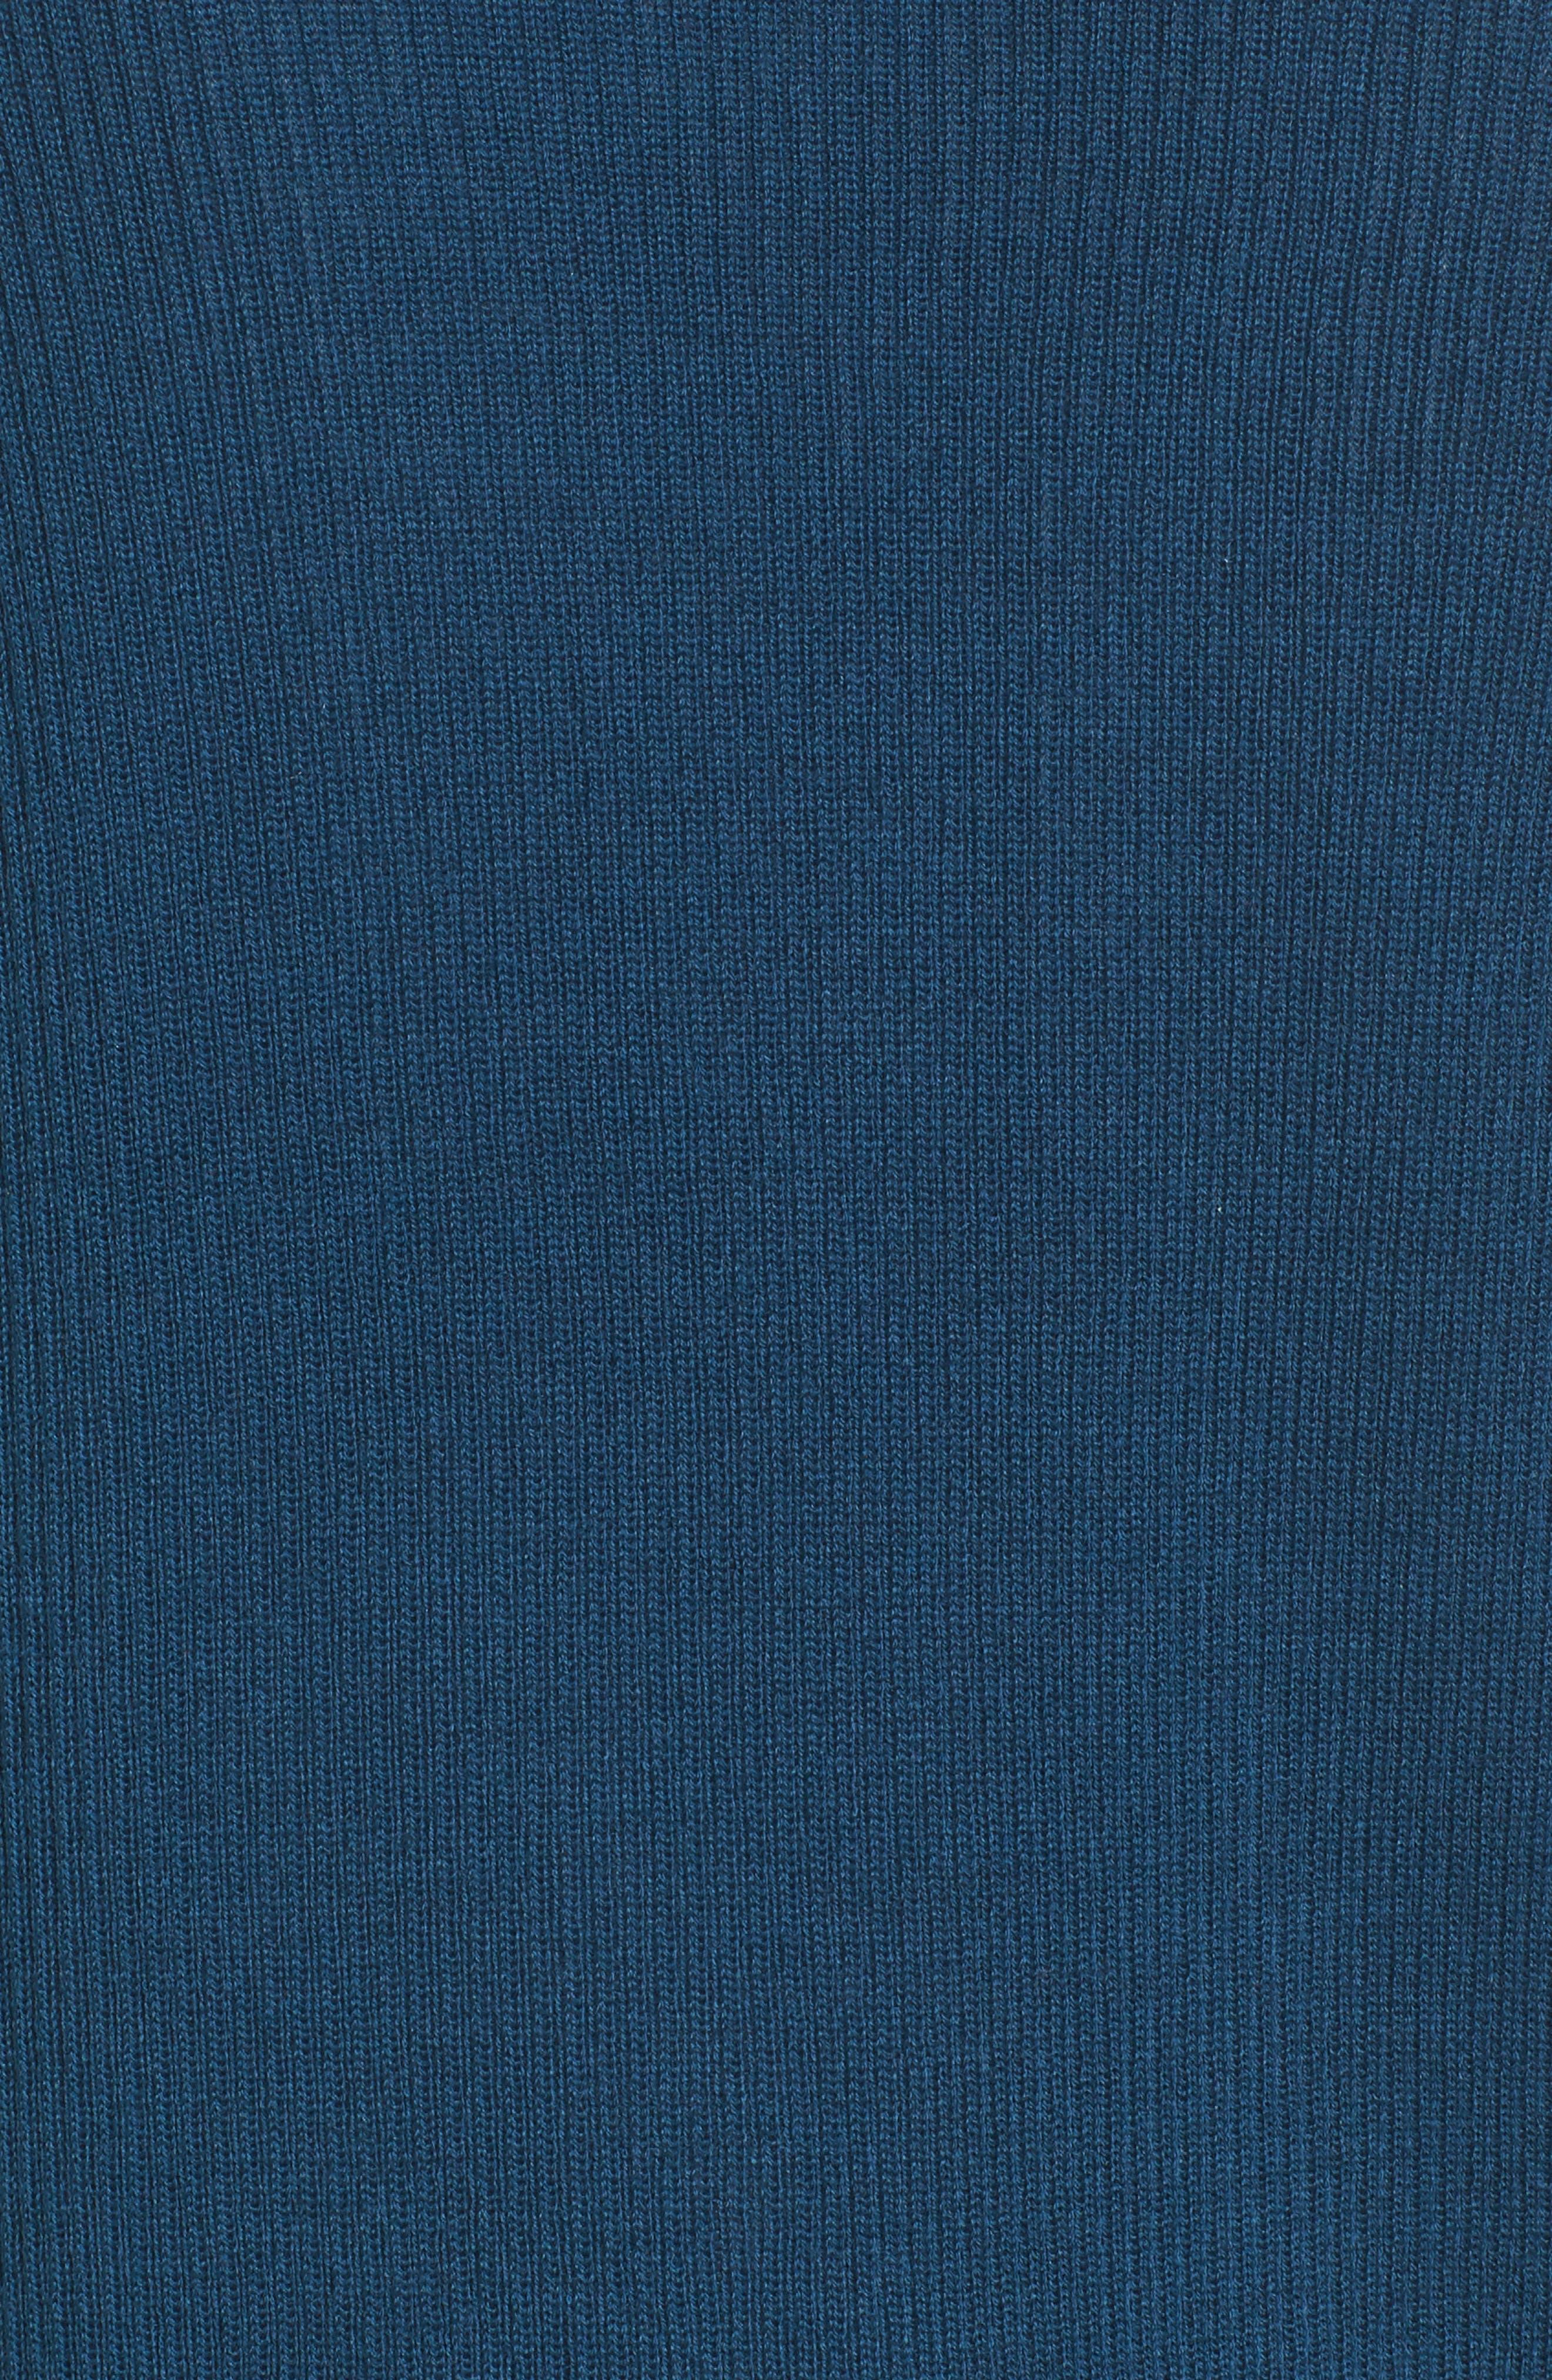 Rib Knit Wool Blend Cardigan,                             Alternate thumbnail 90, color,